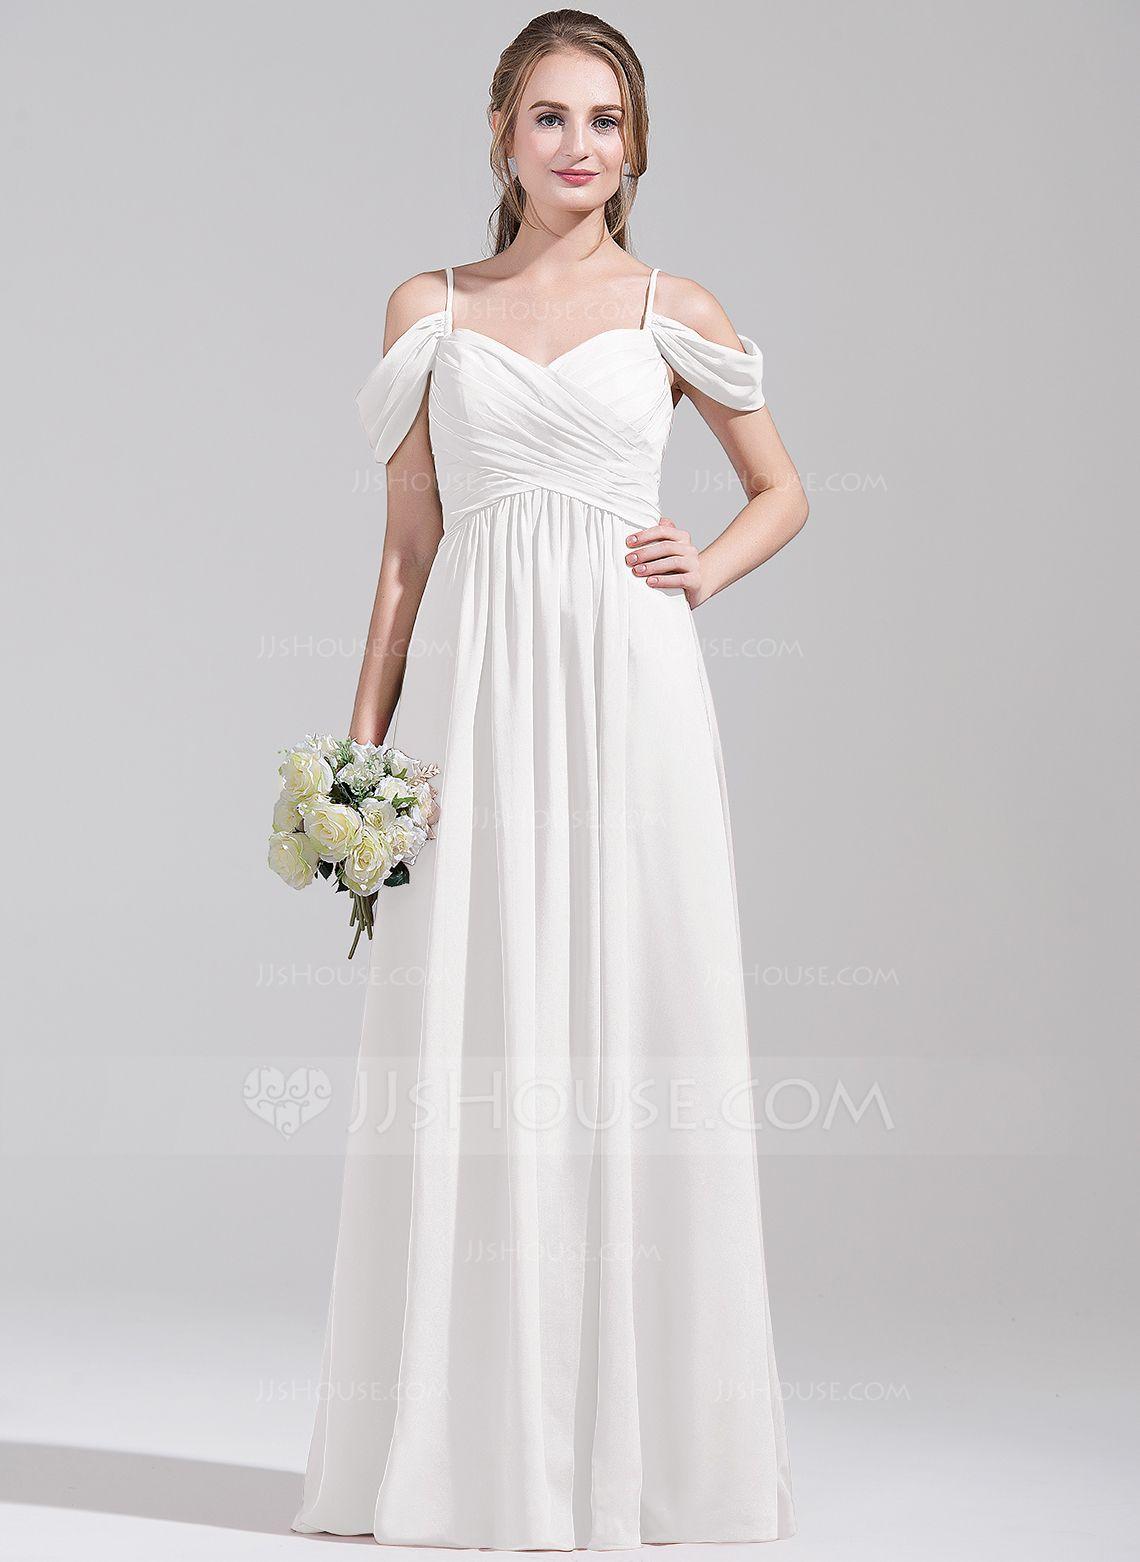 A-Line/Princess Off-the-Shoulder Floor-Length Chiffon Bridesmaid ...